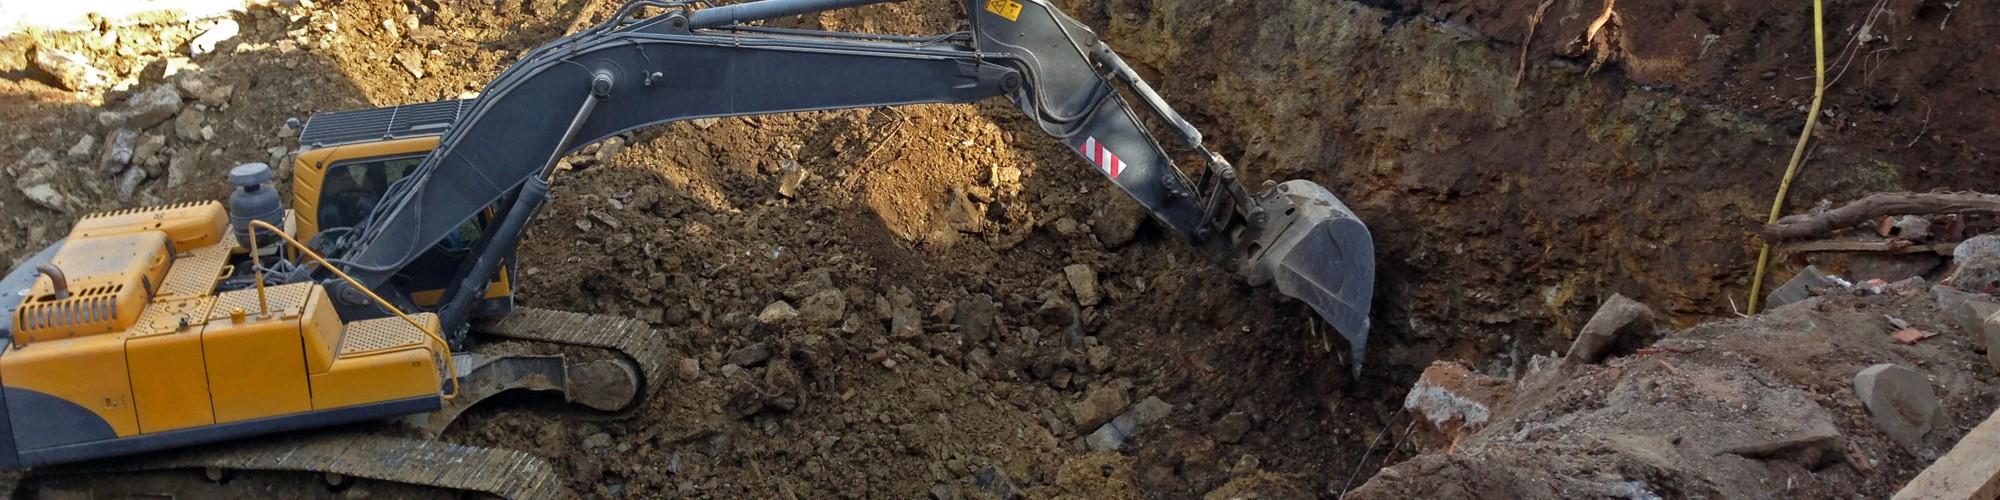 Foto: Bagger in einer Baugrube